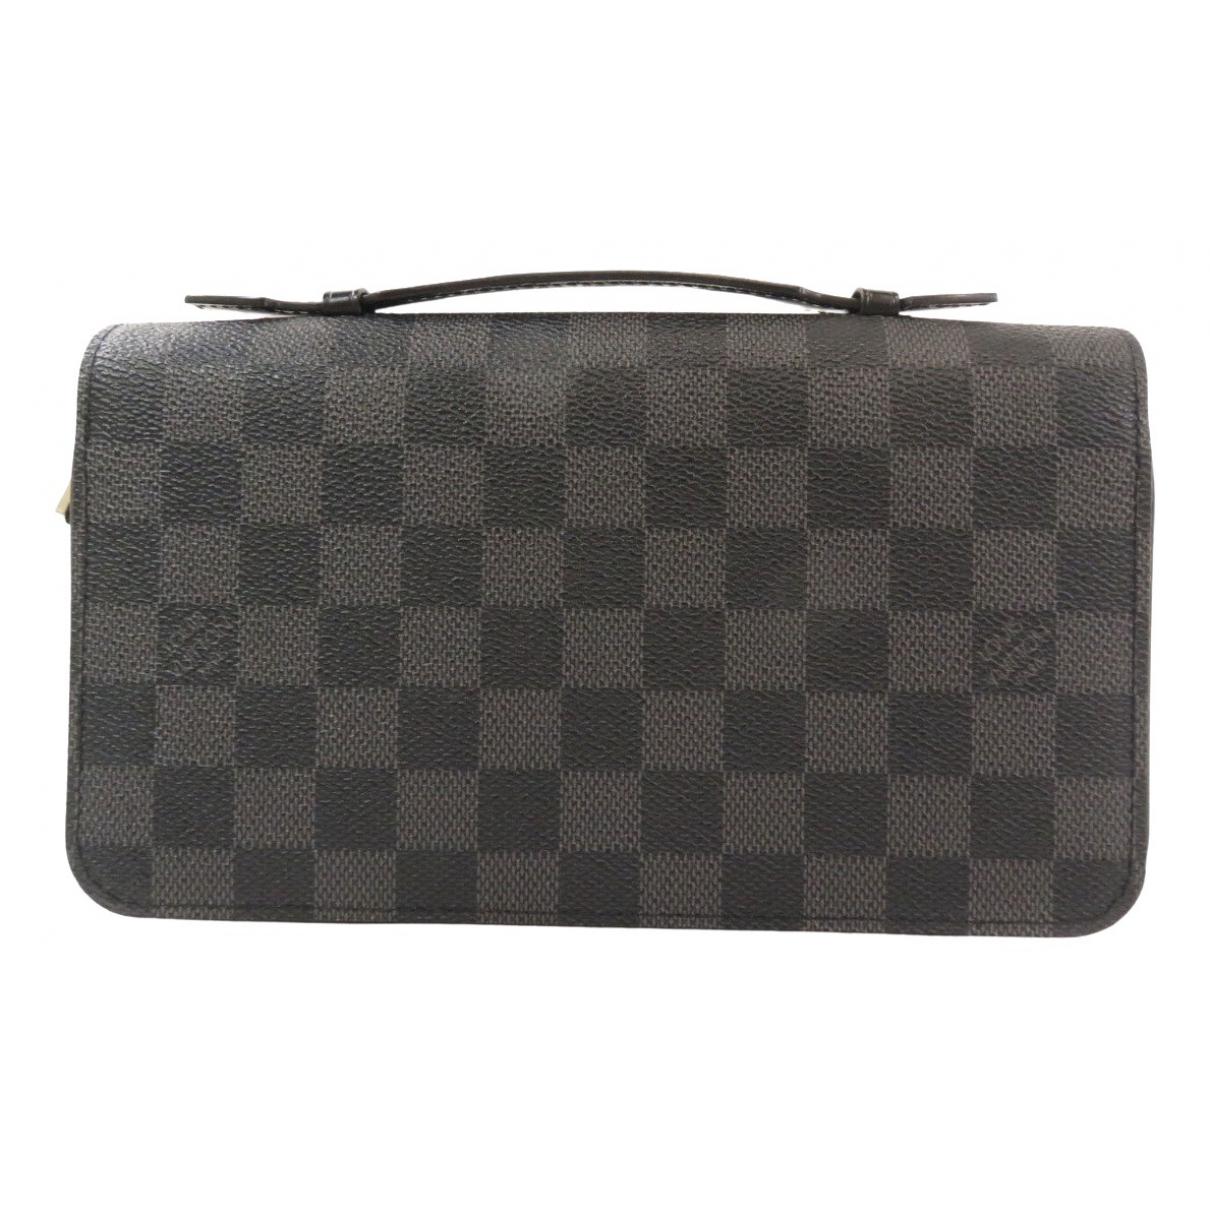 Marroquineria Zippy XL de Lona Louis Vuitton